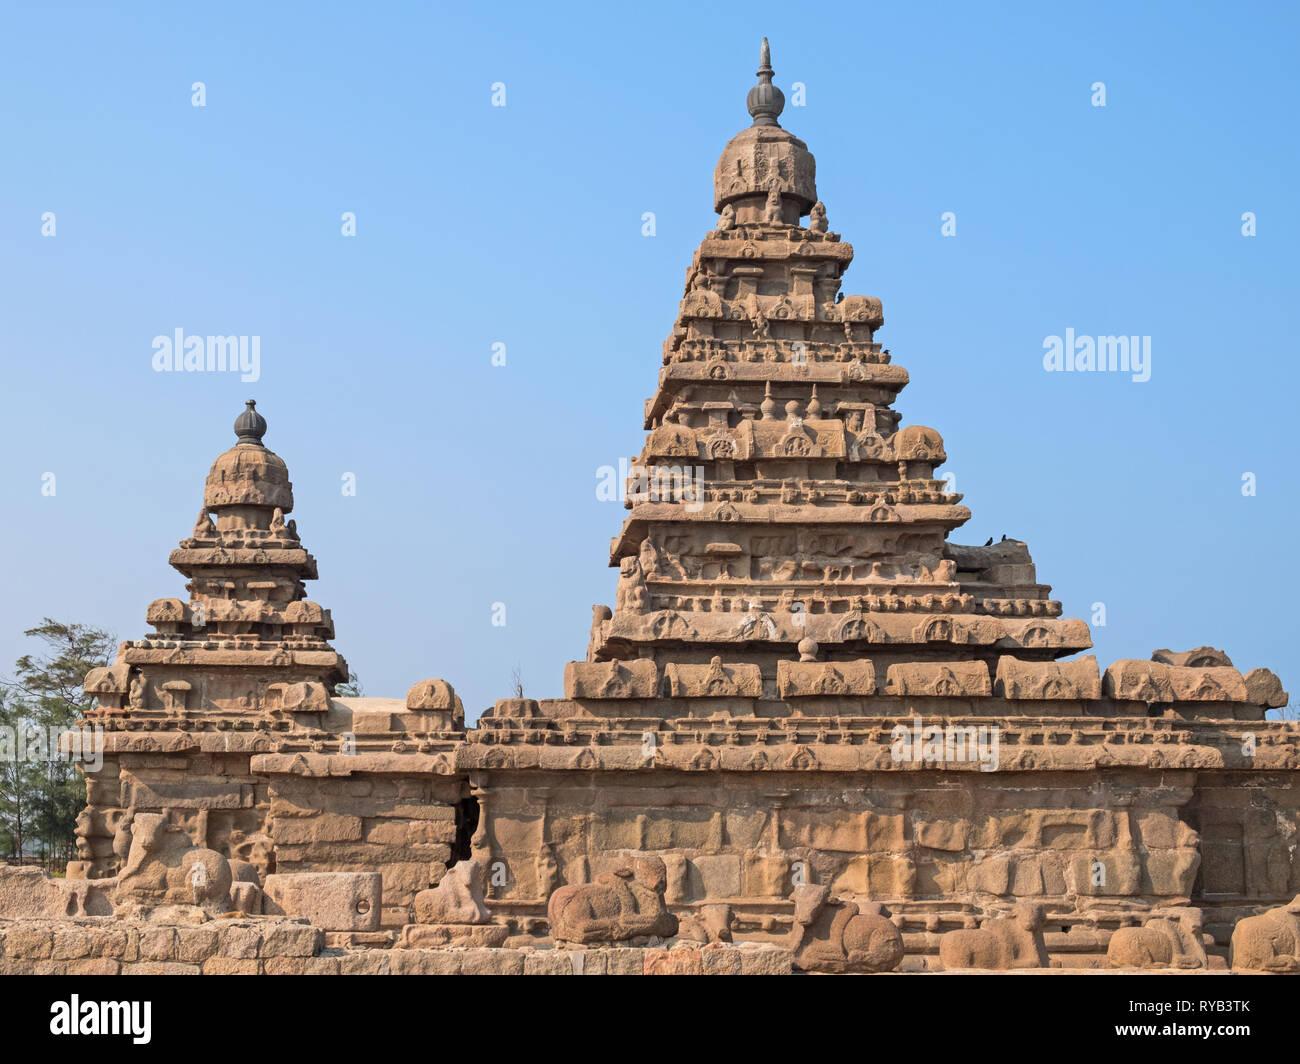 The Shore Temple at Mamalapuram on the Coromandel coast of Tamil Nadu, India, built in the 8th century - Stock Image